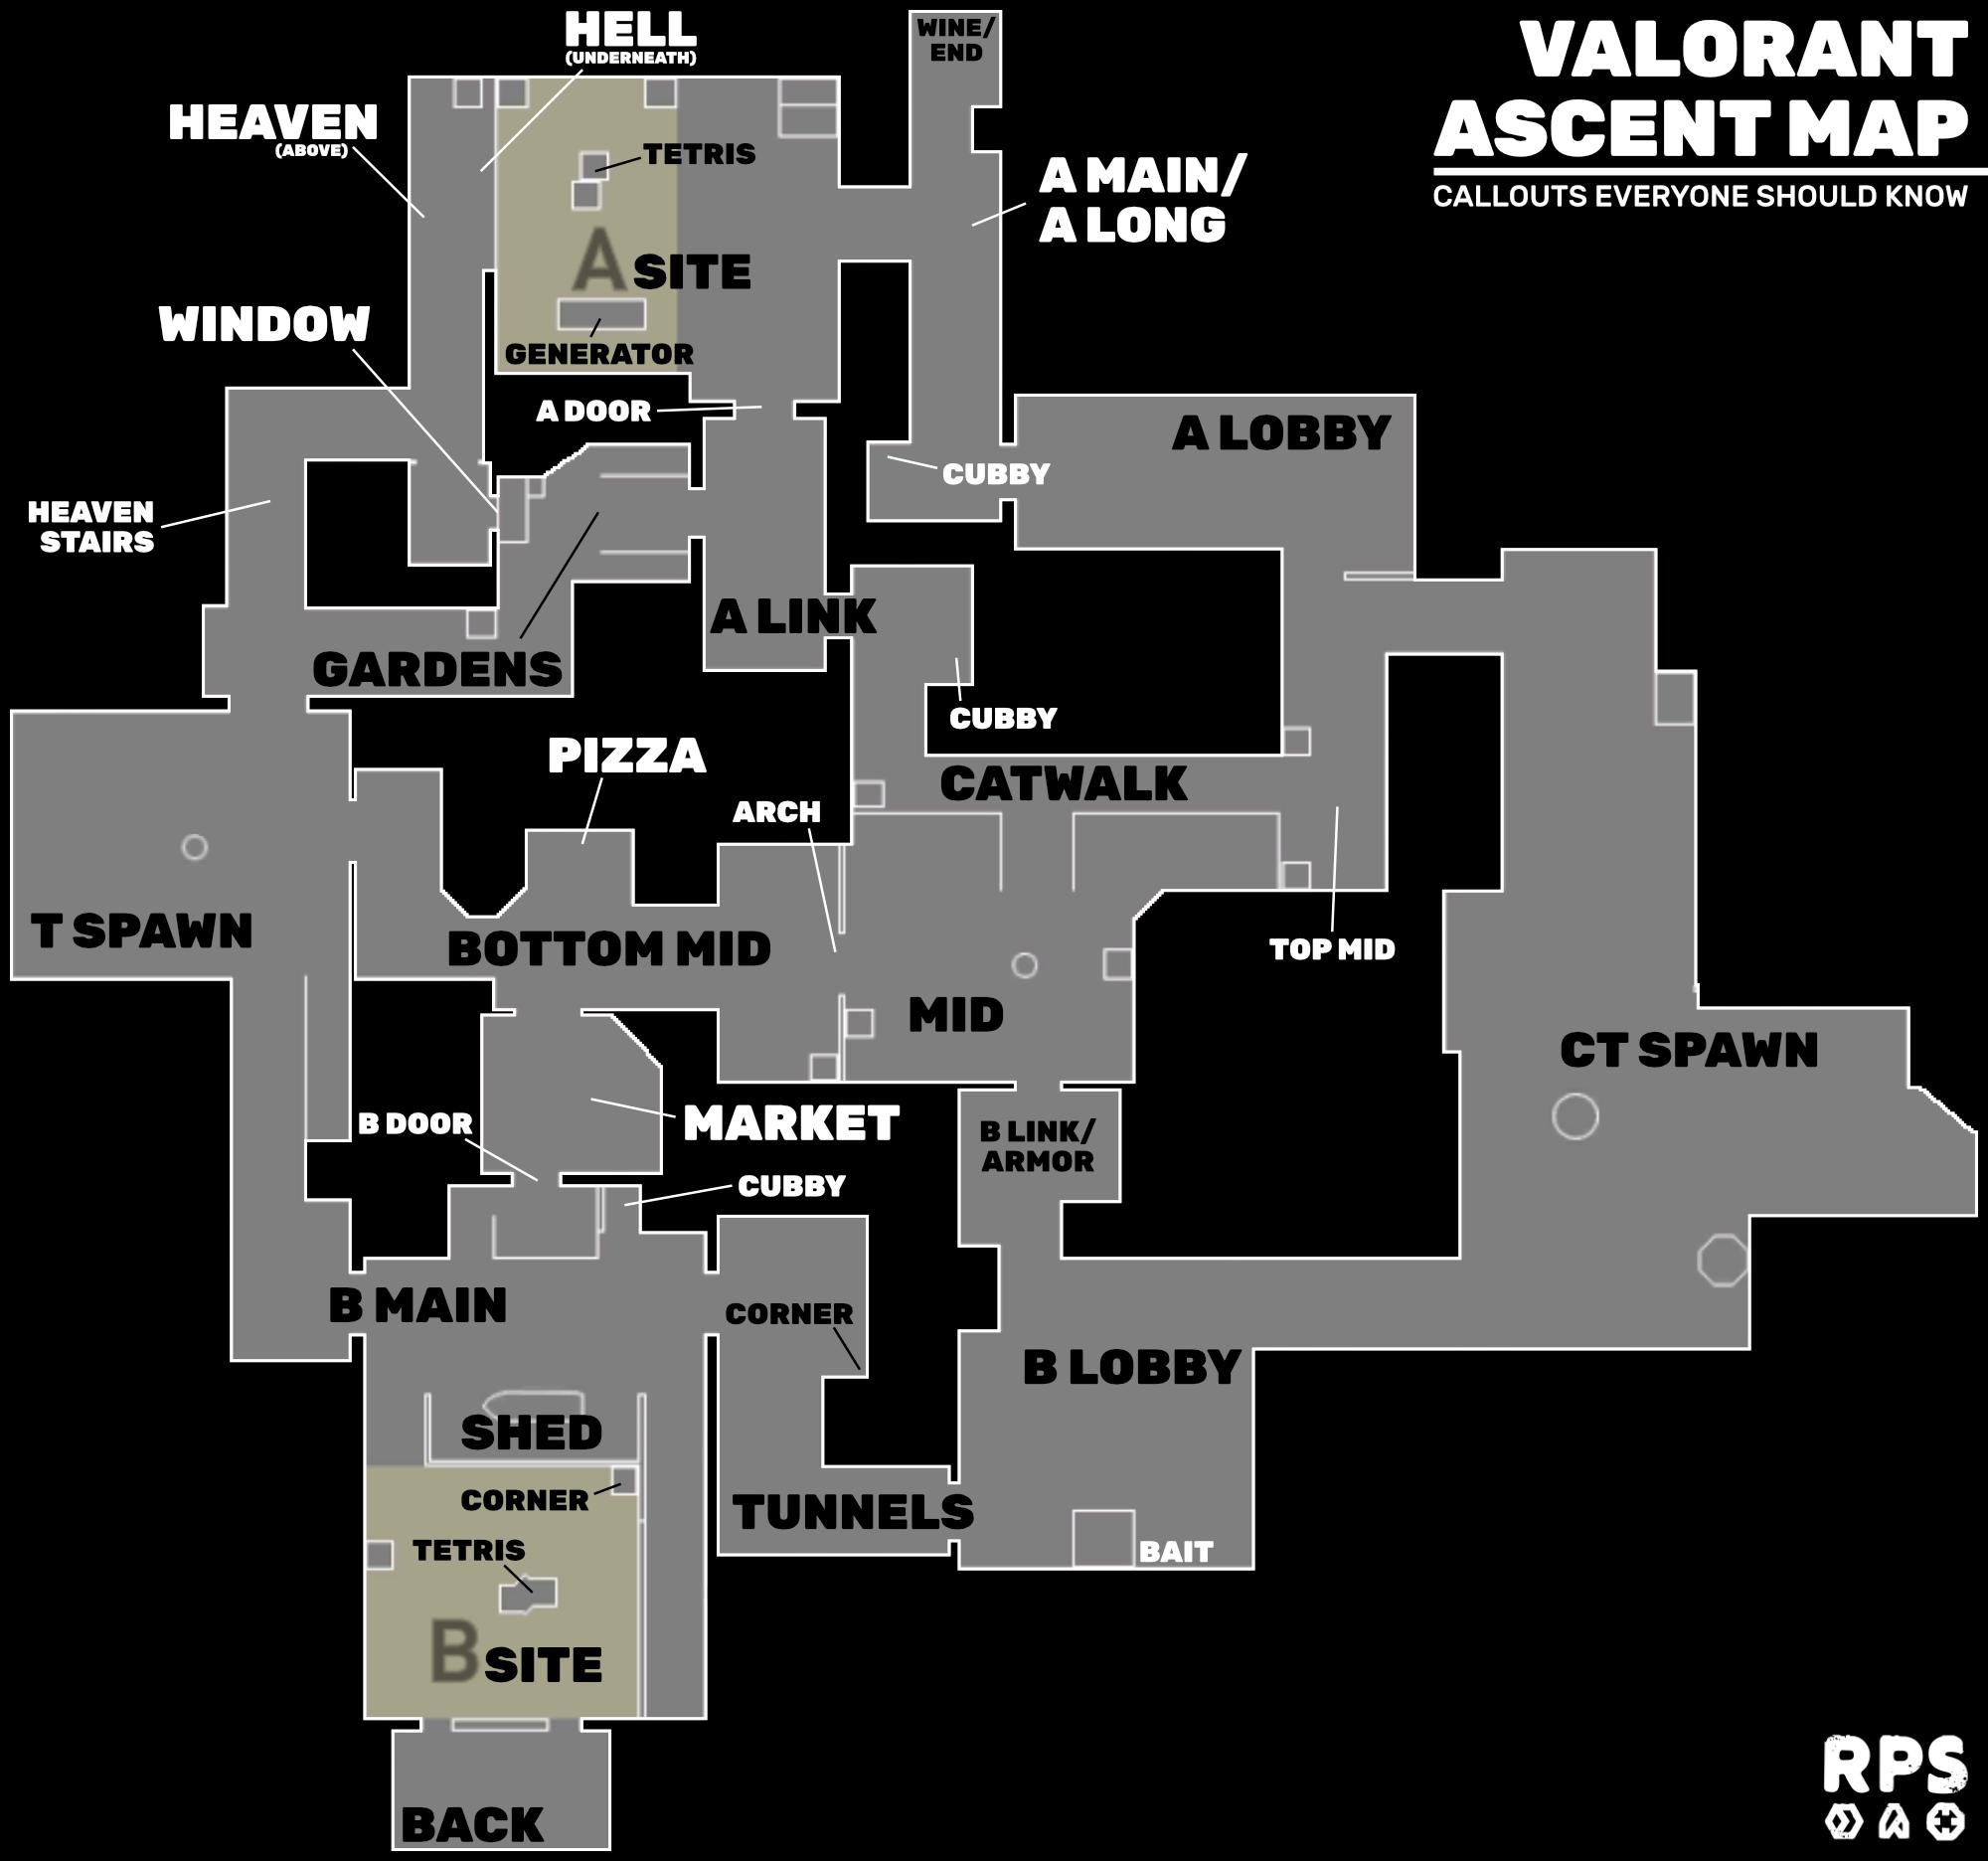 Valorant Ascent callouts